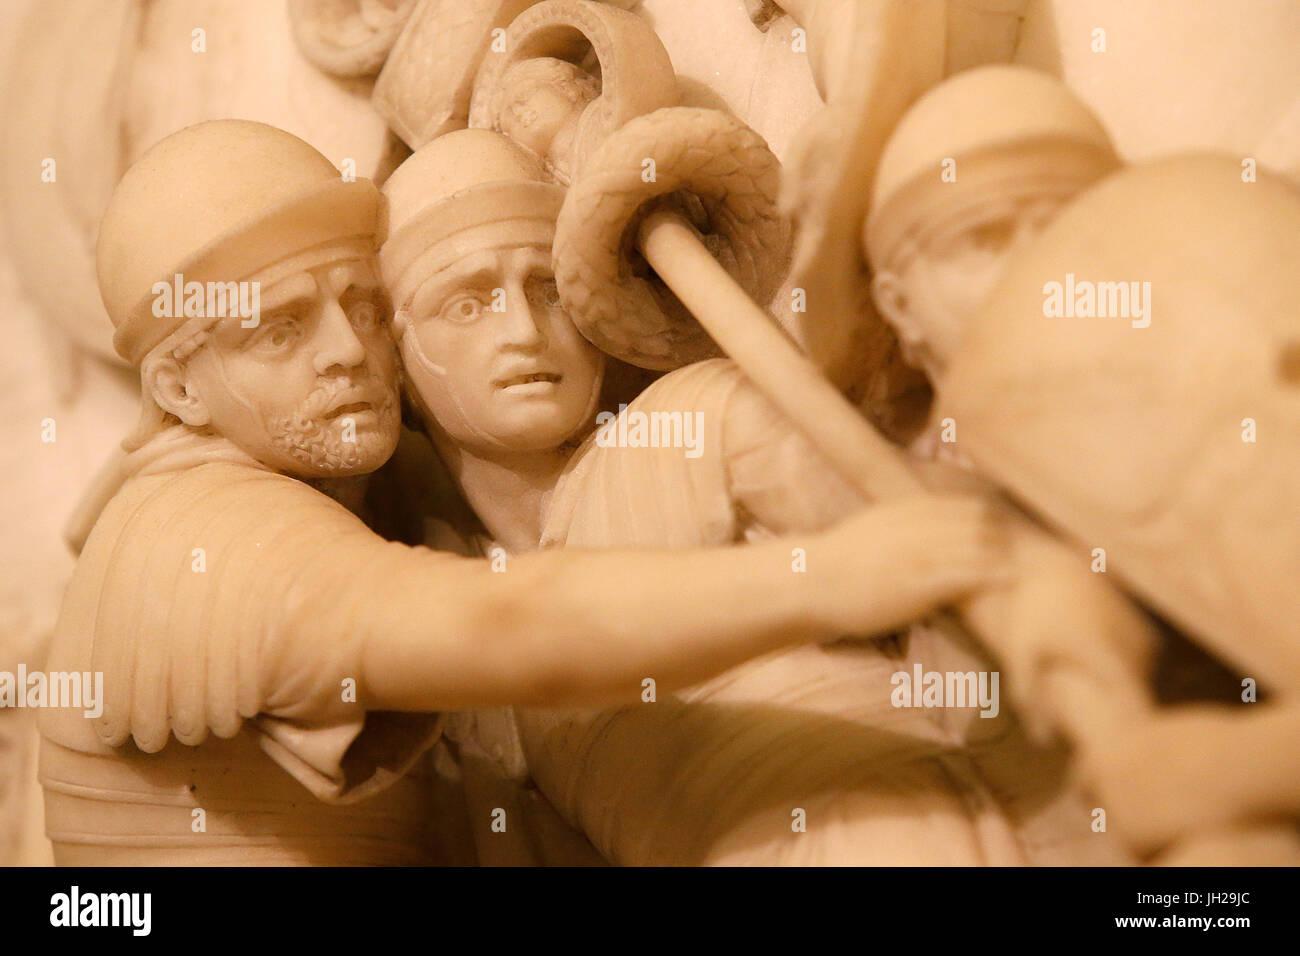 The Victoria and Albert Museum. John Deare. Caesar invading Britain (detail). 1796. Marble. United kingdom. - Stock Image